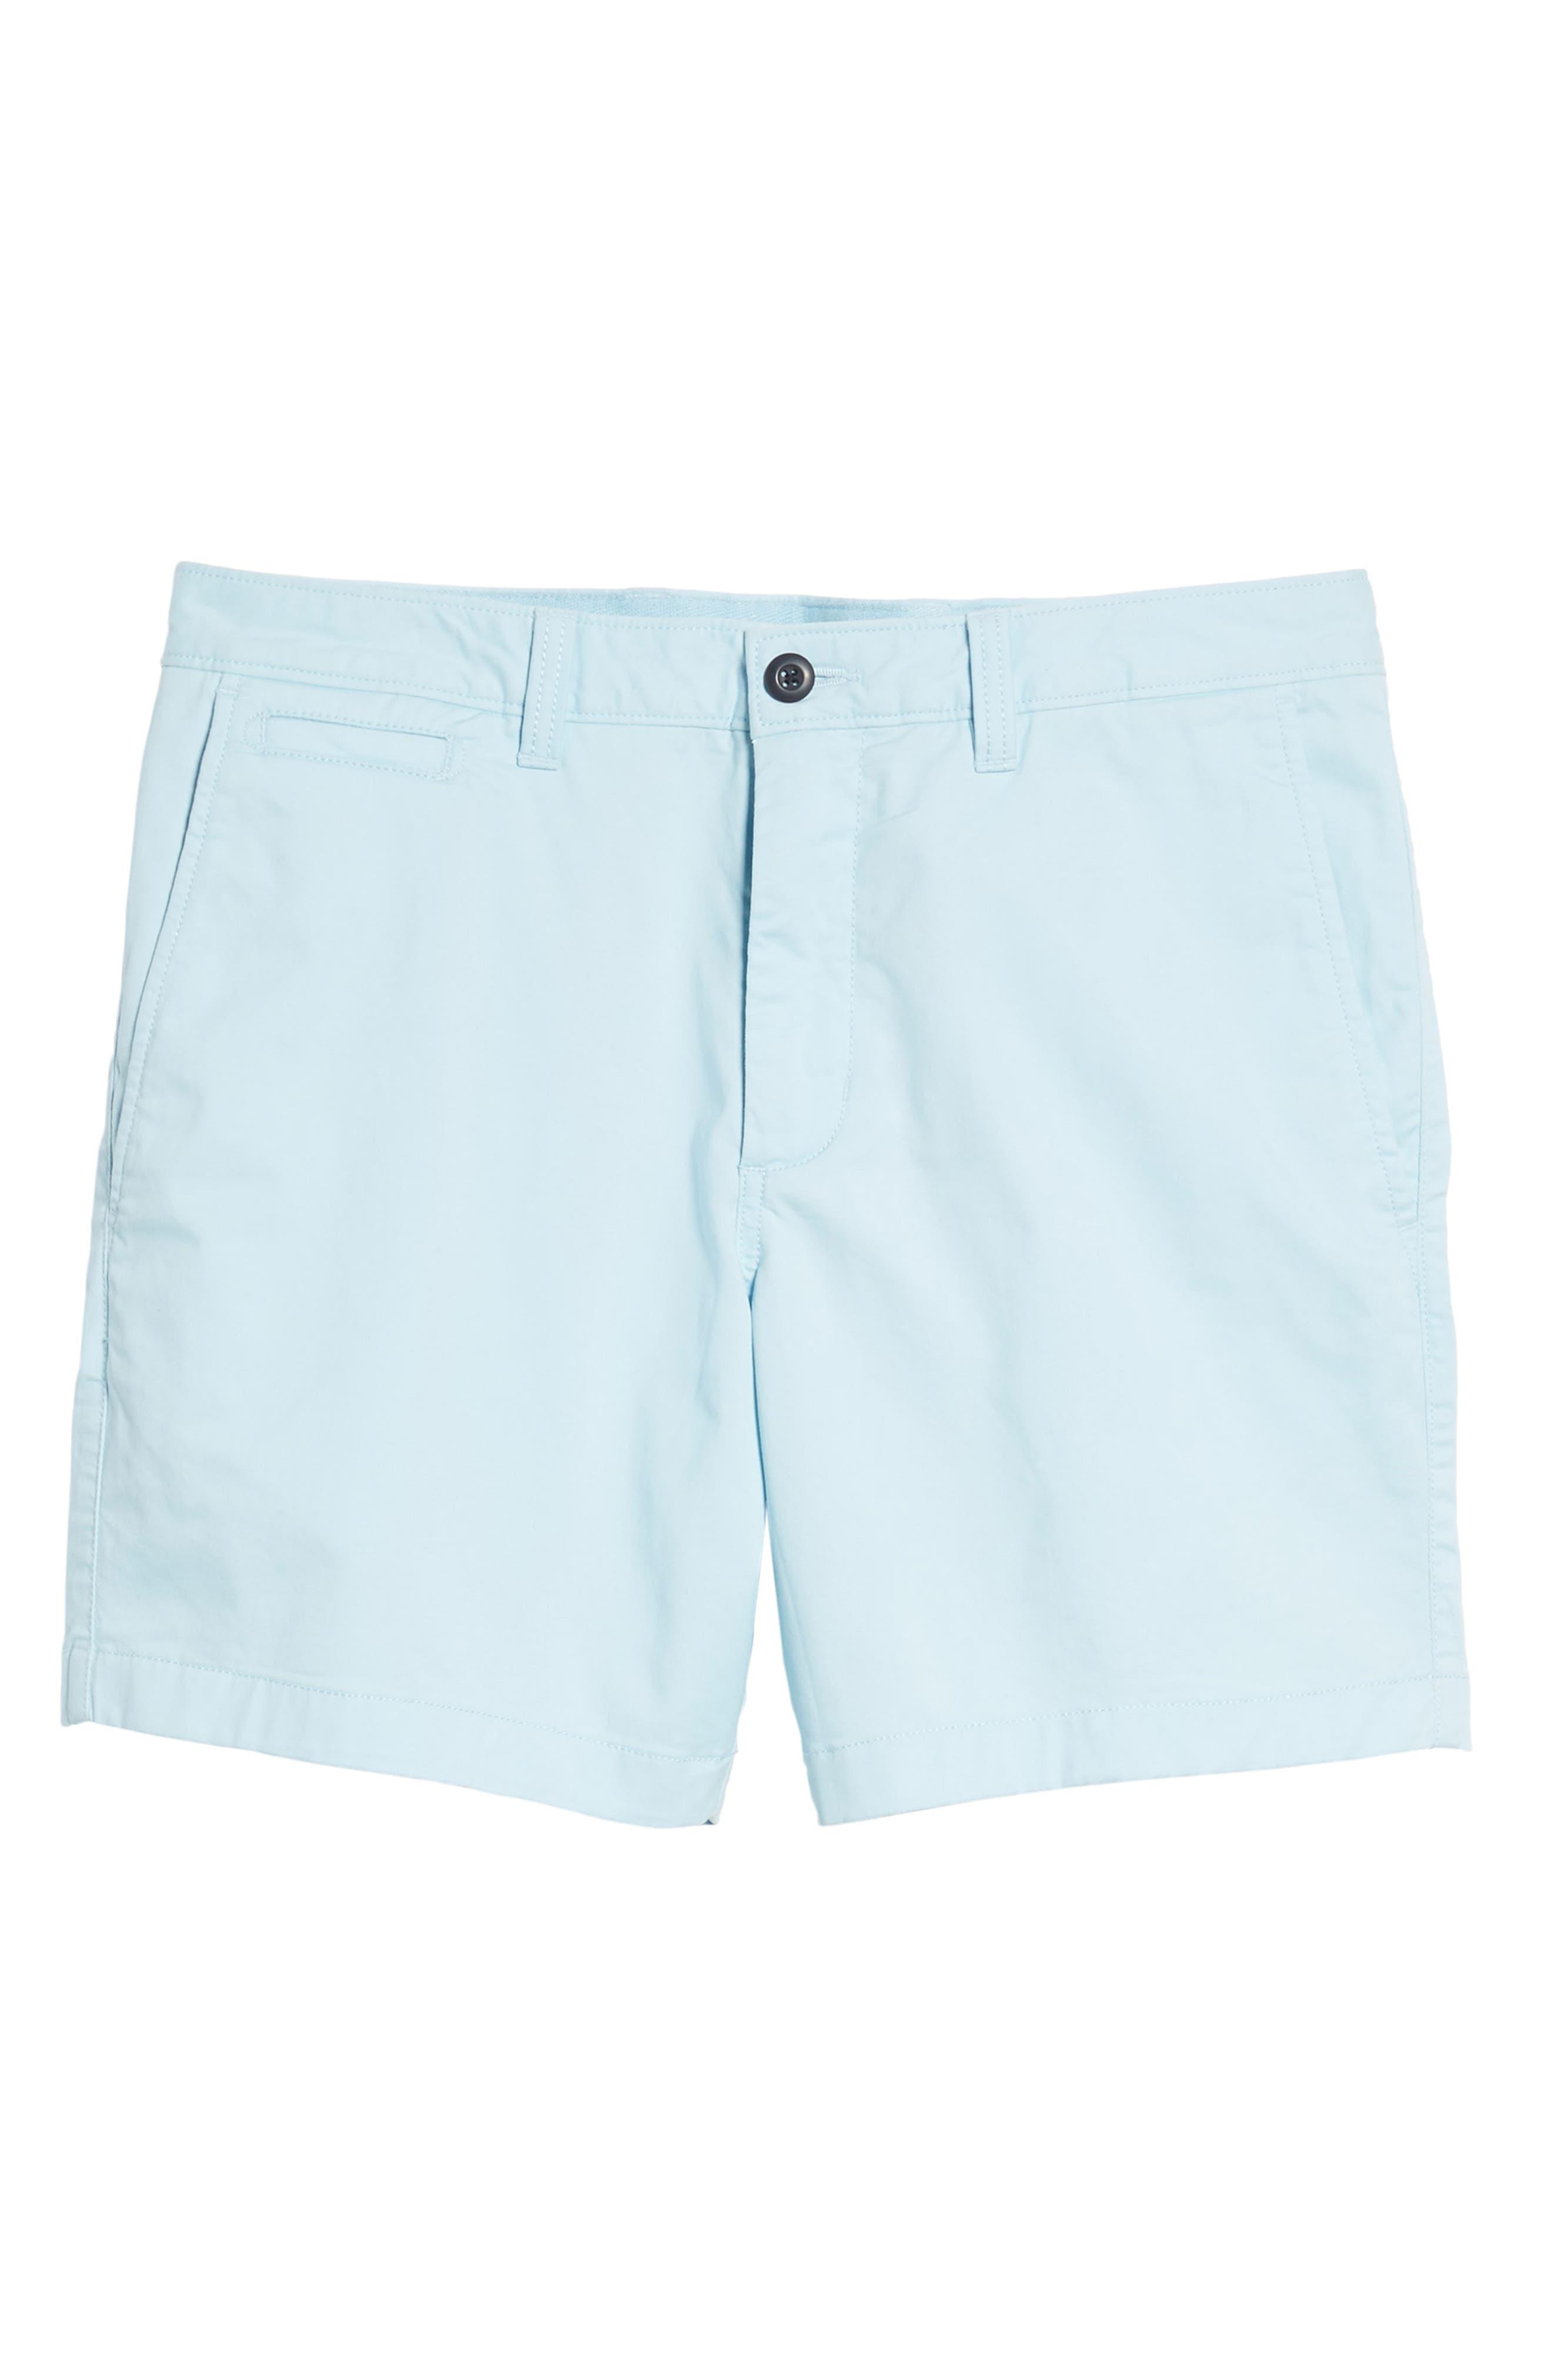 Ballard Slim Fit Stretch Chino 7-Inch Shorts,                             Alternate thumbnail 6, color,                             Blue Orydalis